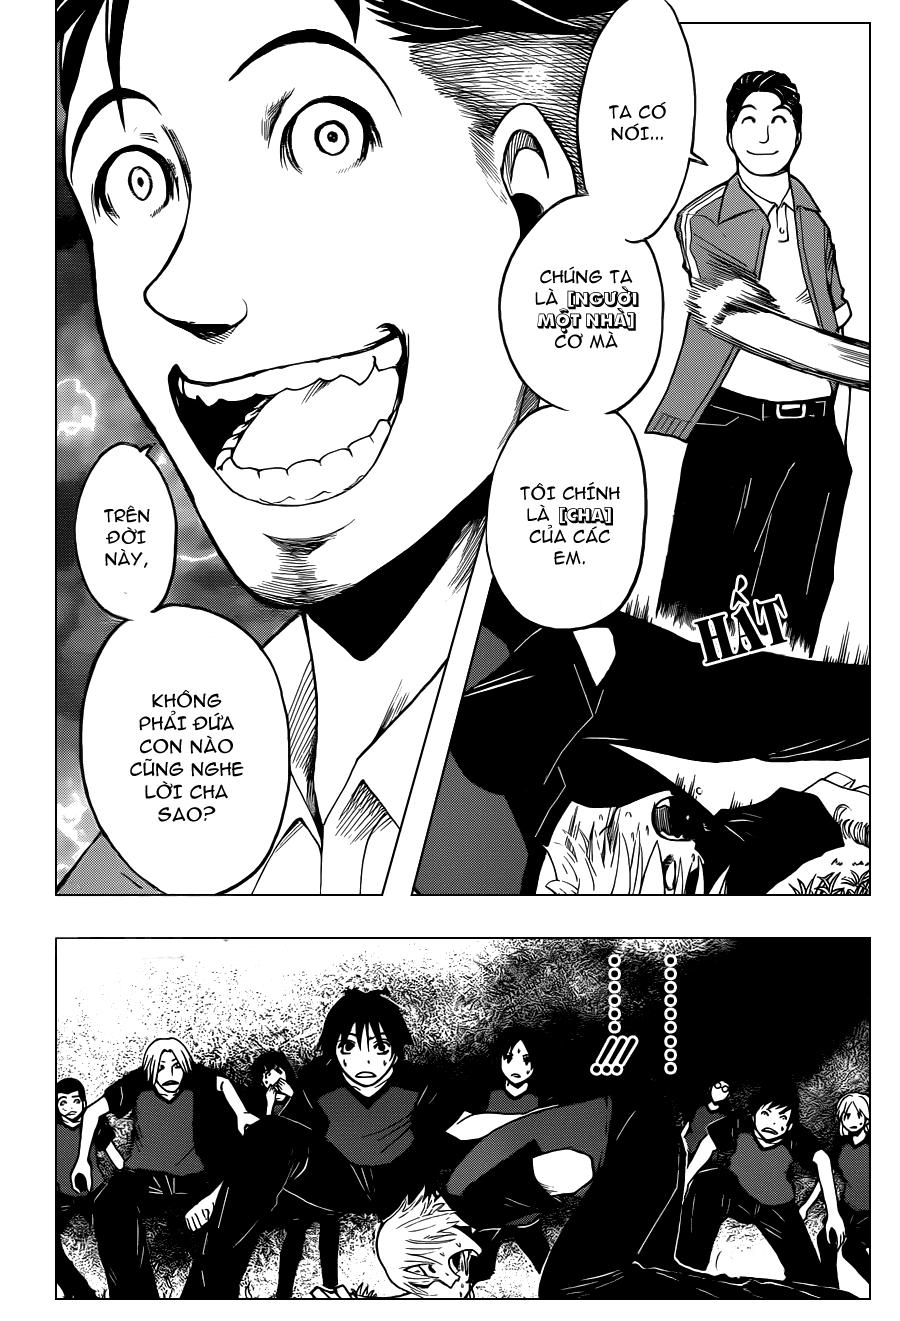 Ansatsu Kyoushitsu chap 39 trang 14